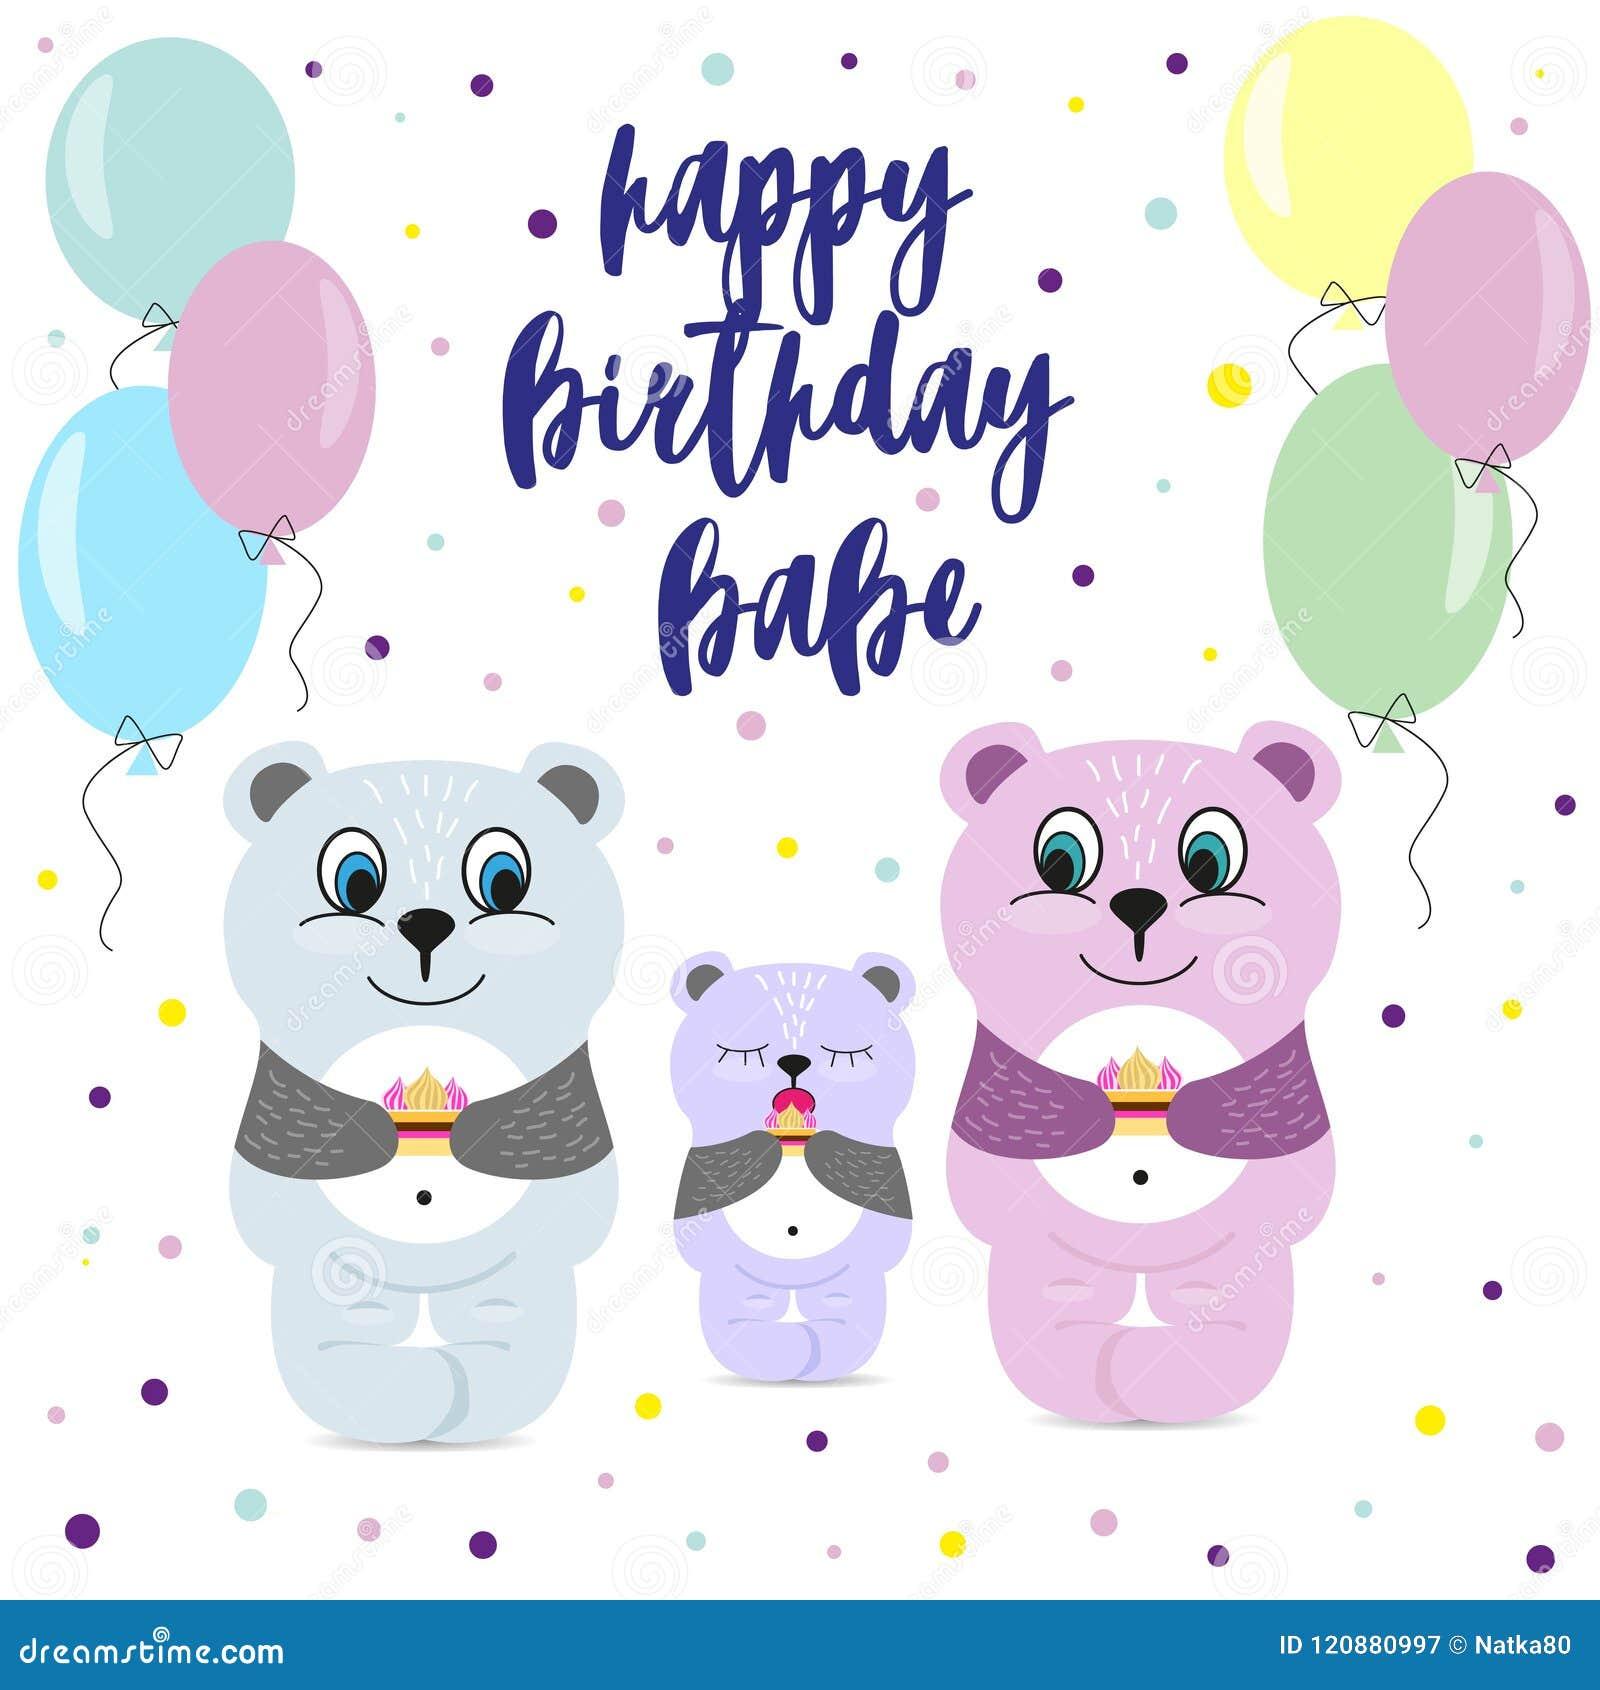 Mom And Dad Bear Congratulate Baby Happy Birthday Greeting Card